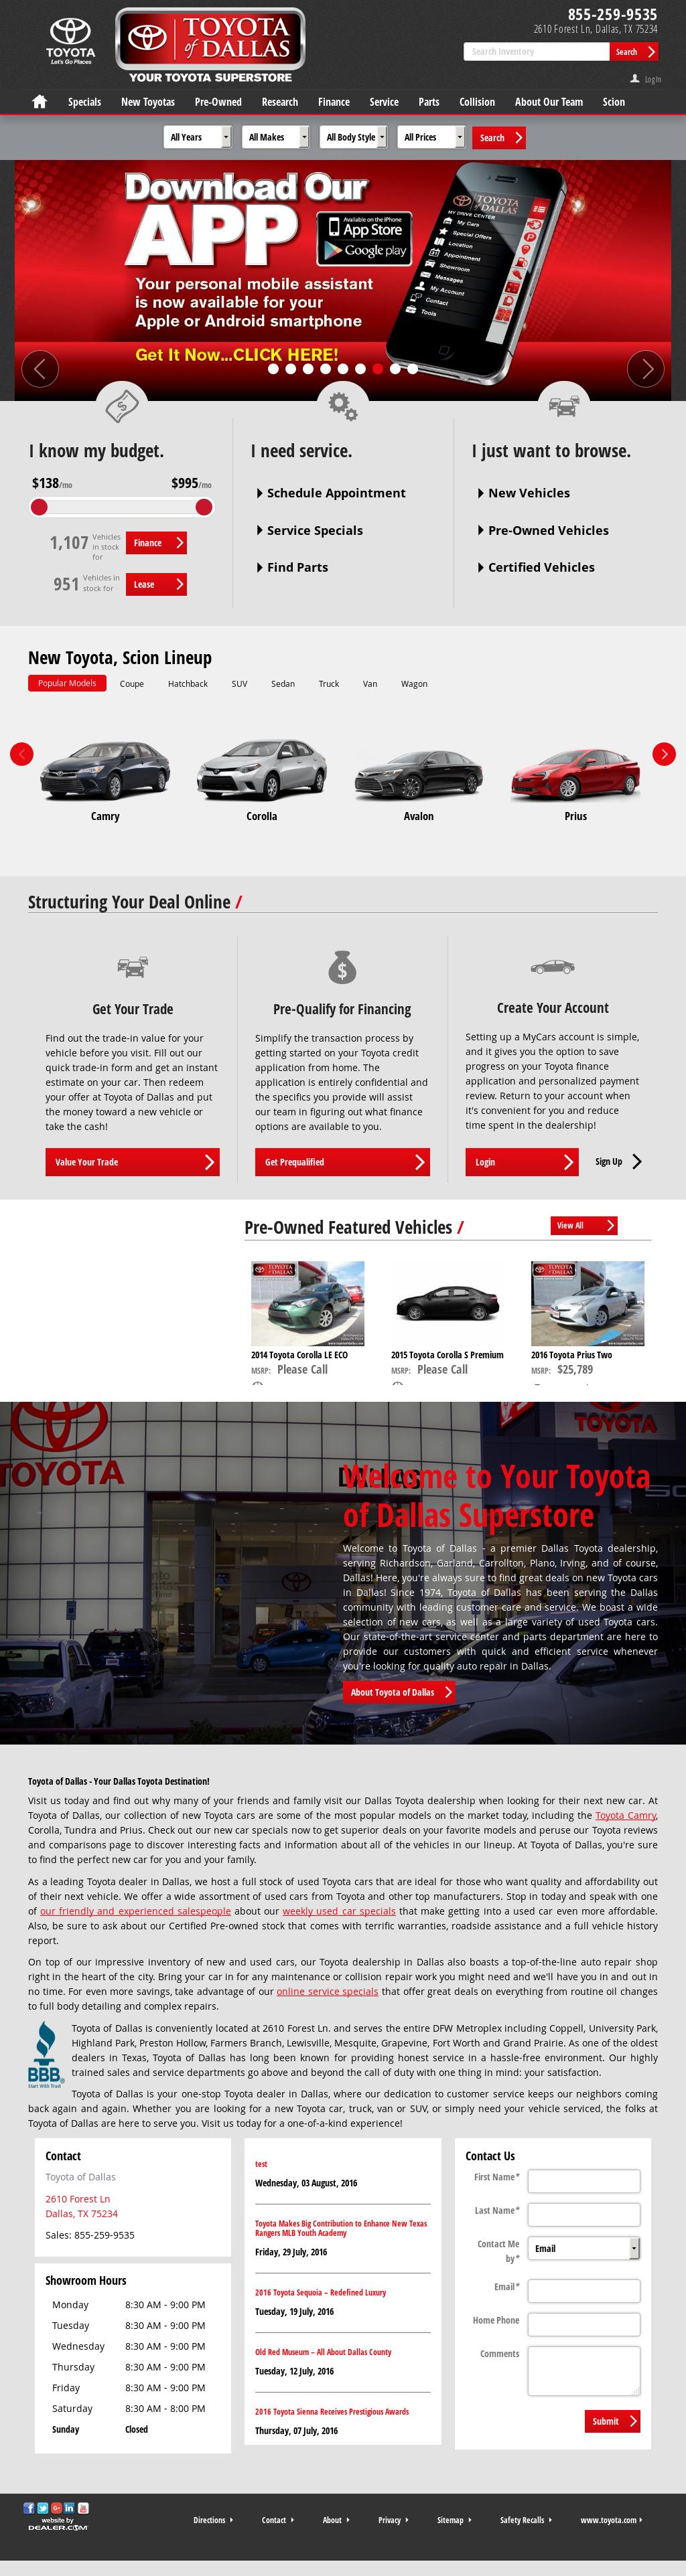 Toyota Dallas petitors Revenue and Employees Owler pany Profile